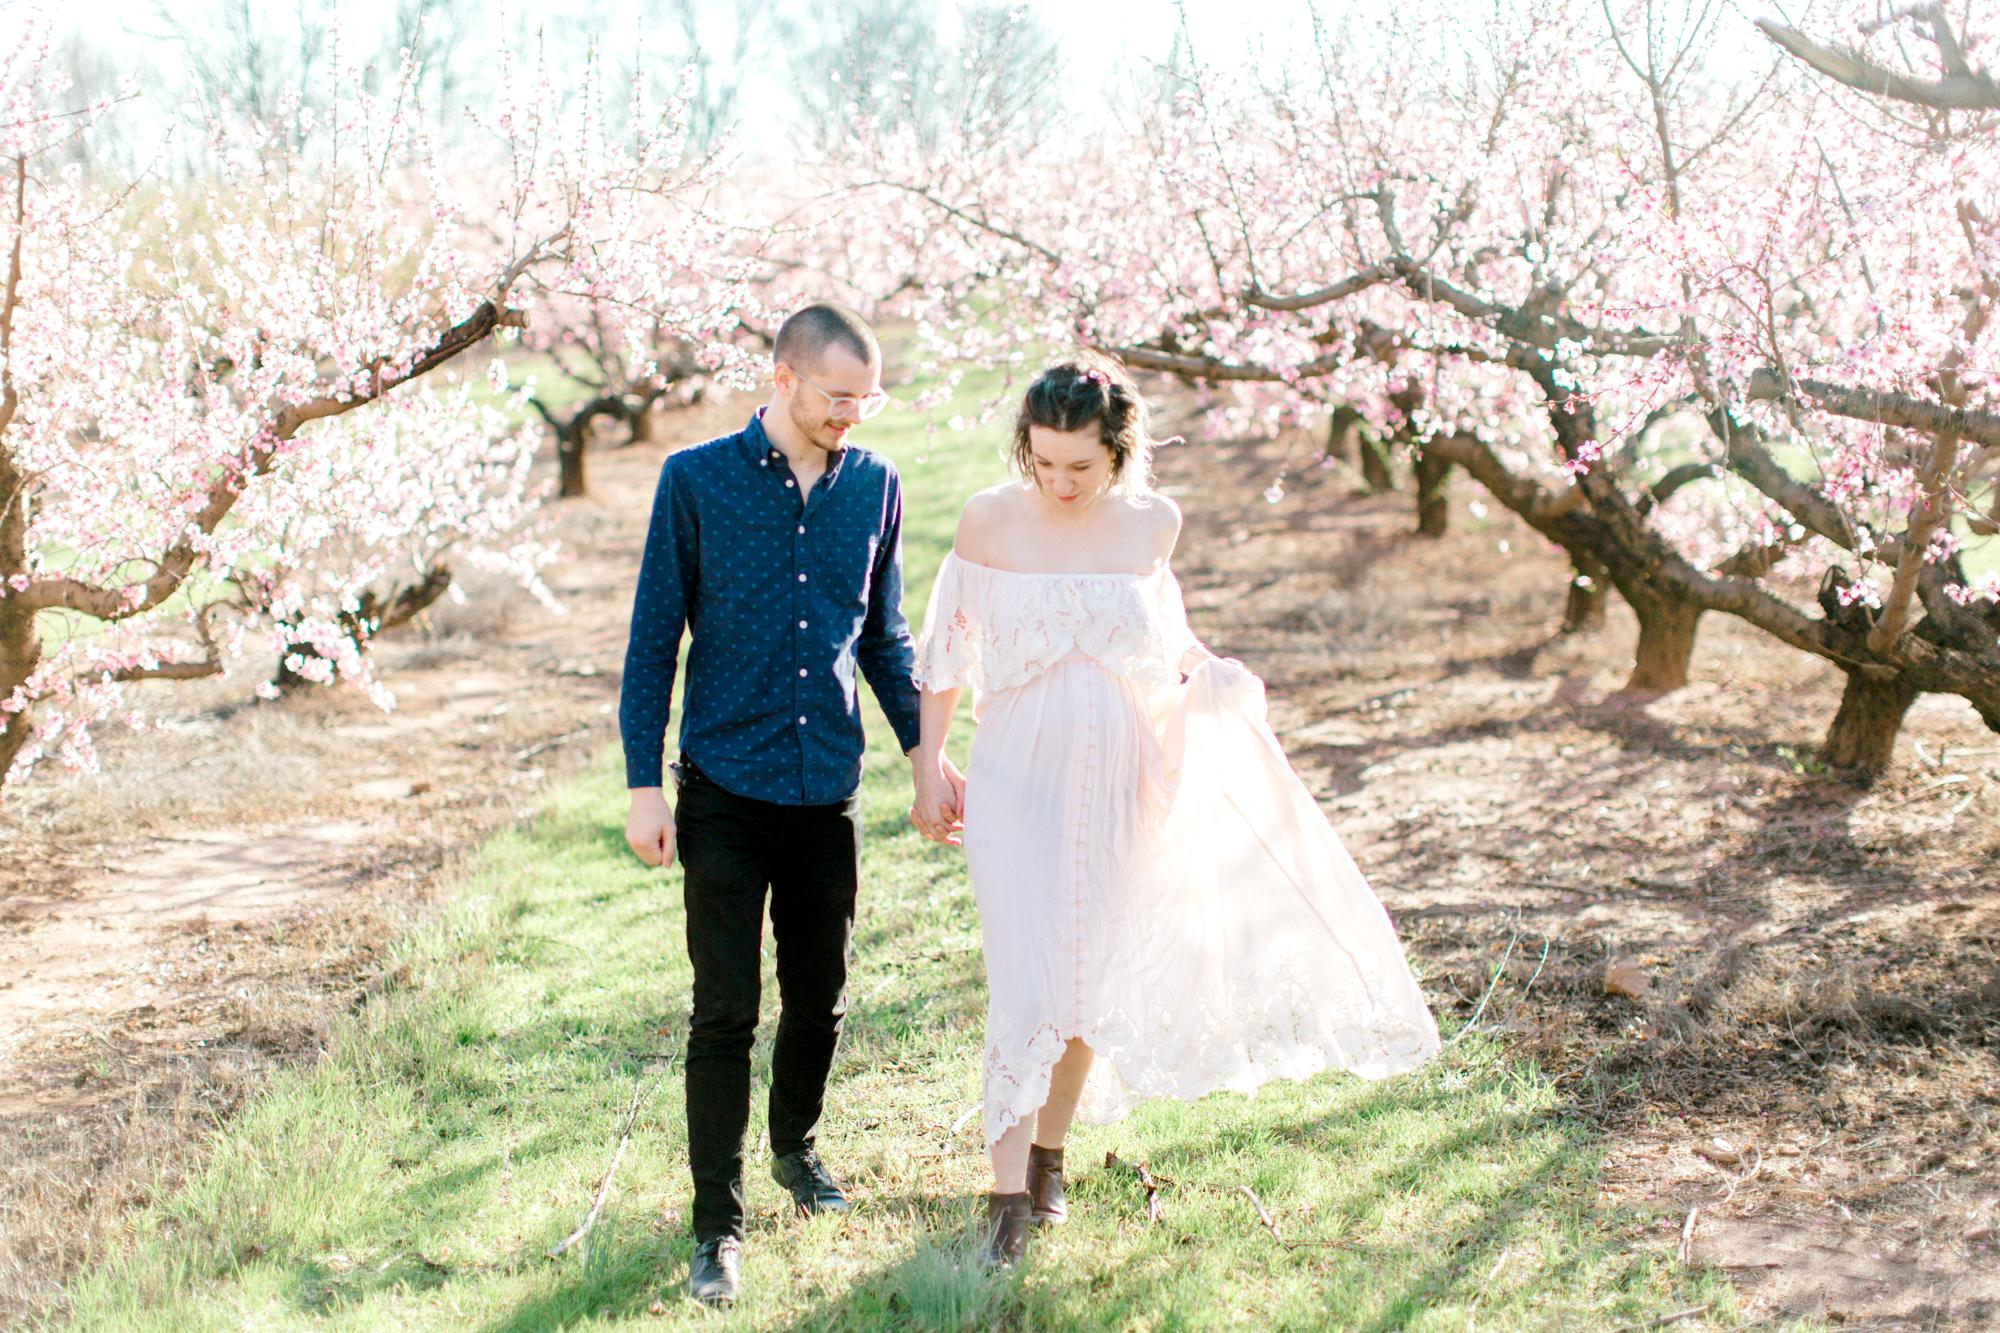 four corners photography peach blossom mini sessions peach blossom maternity session (1 of 25).jpg